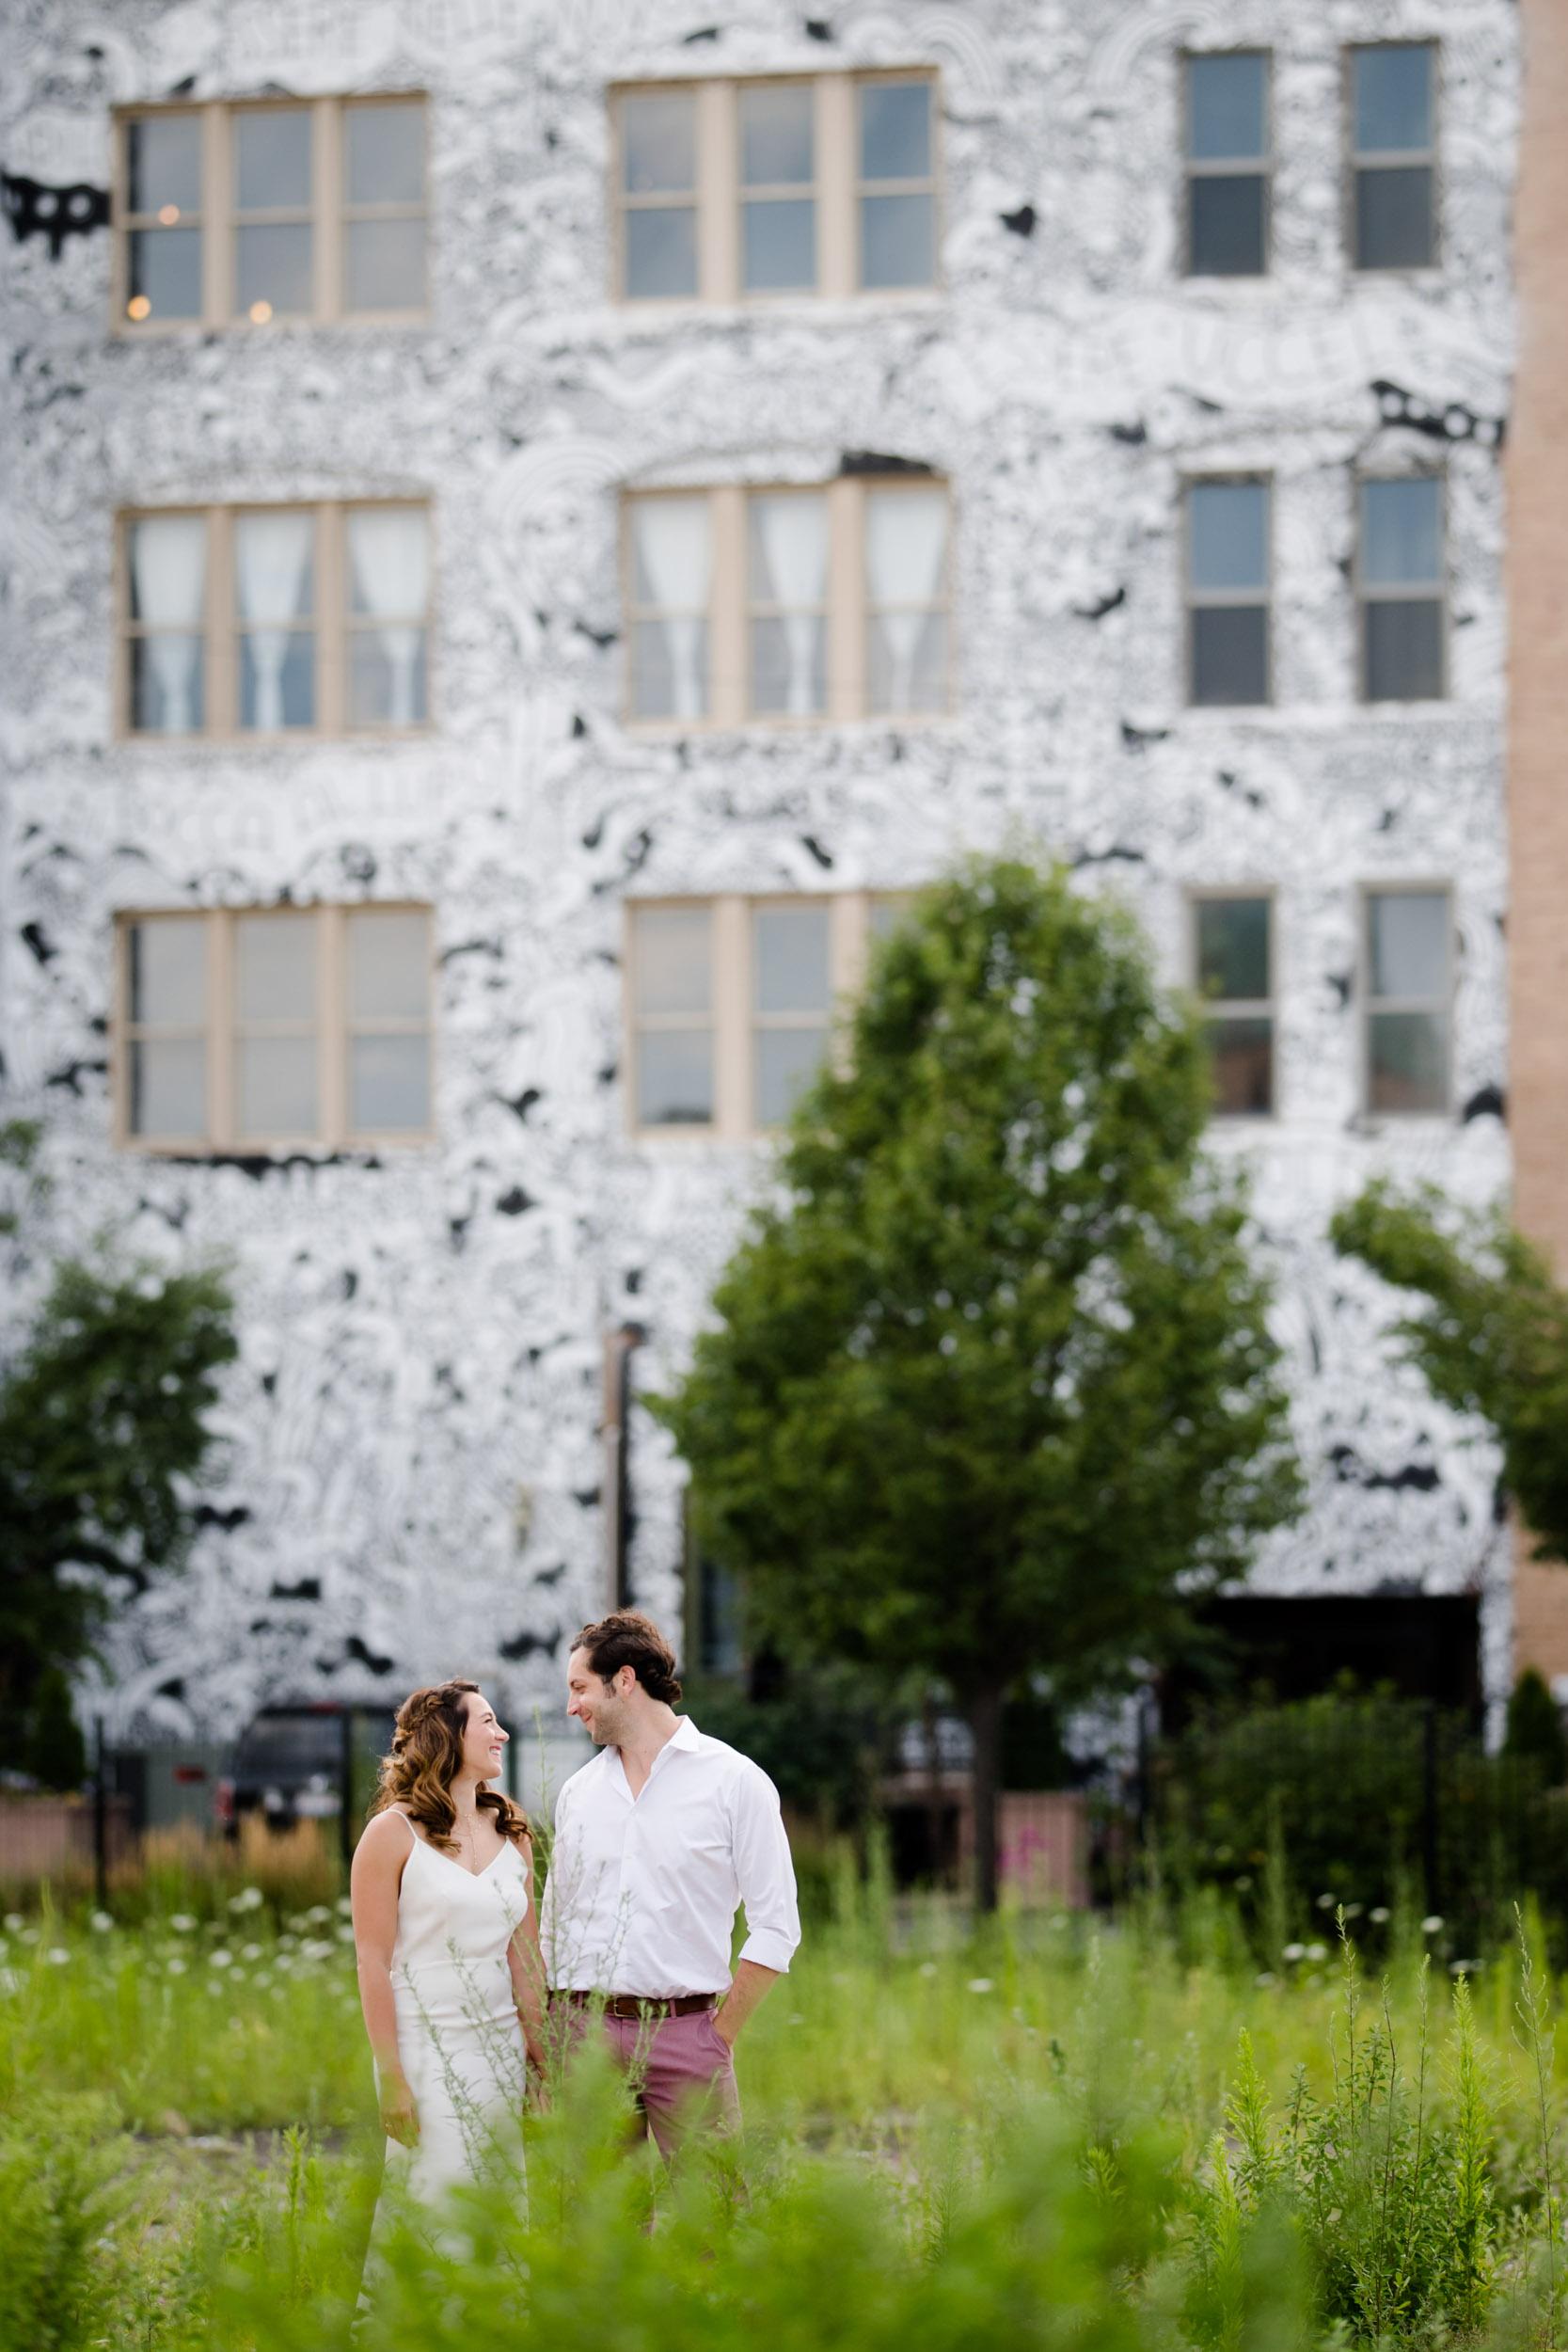 lacuna-artists-loft-wedding-photos-3.jpg